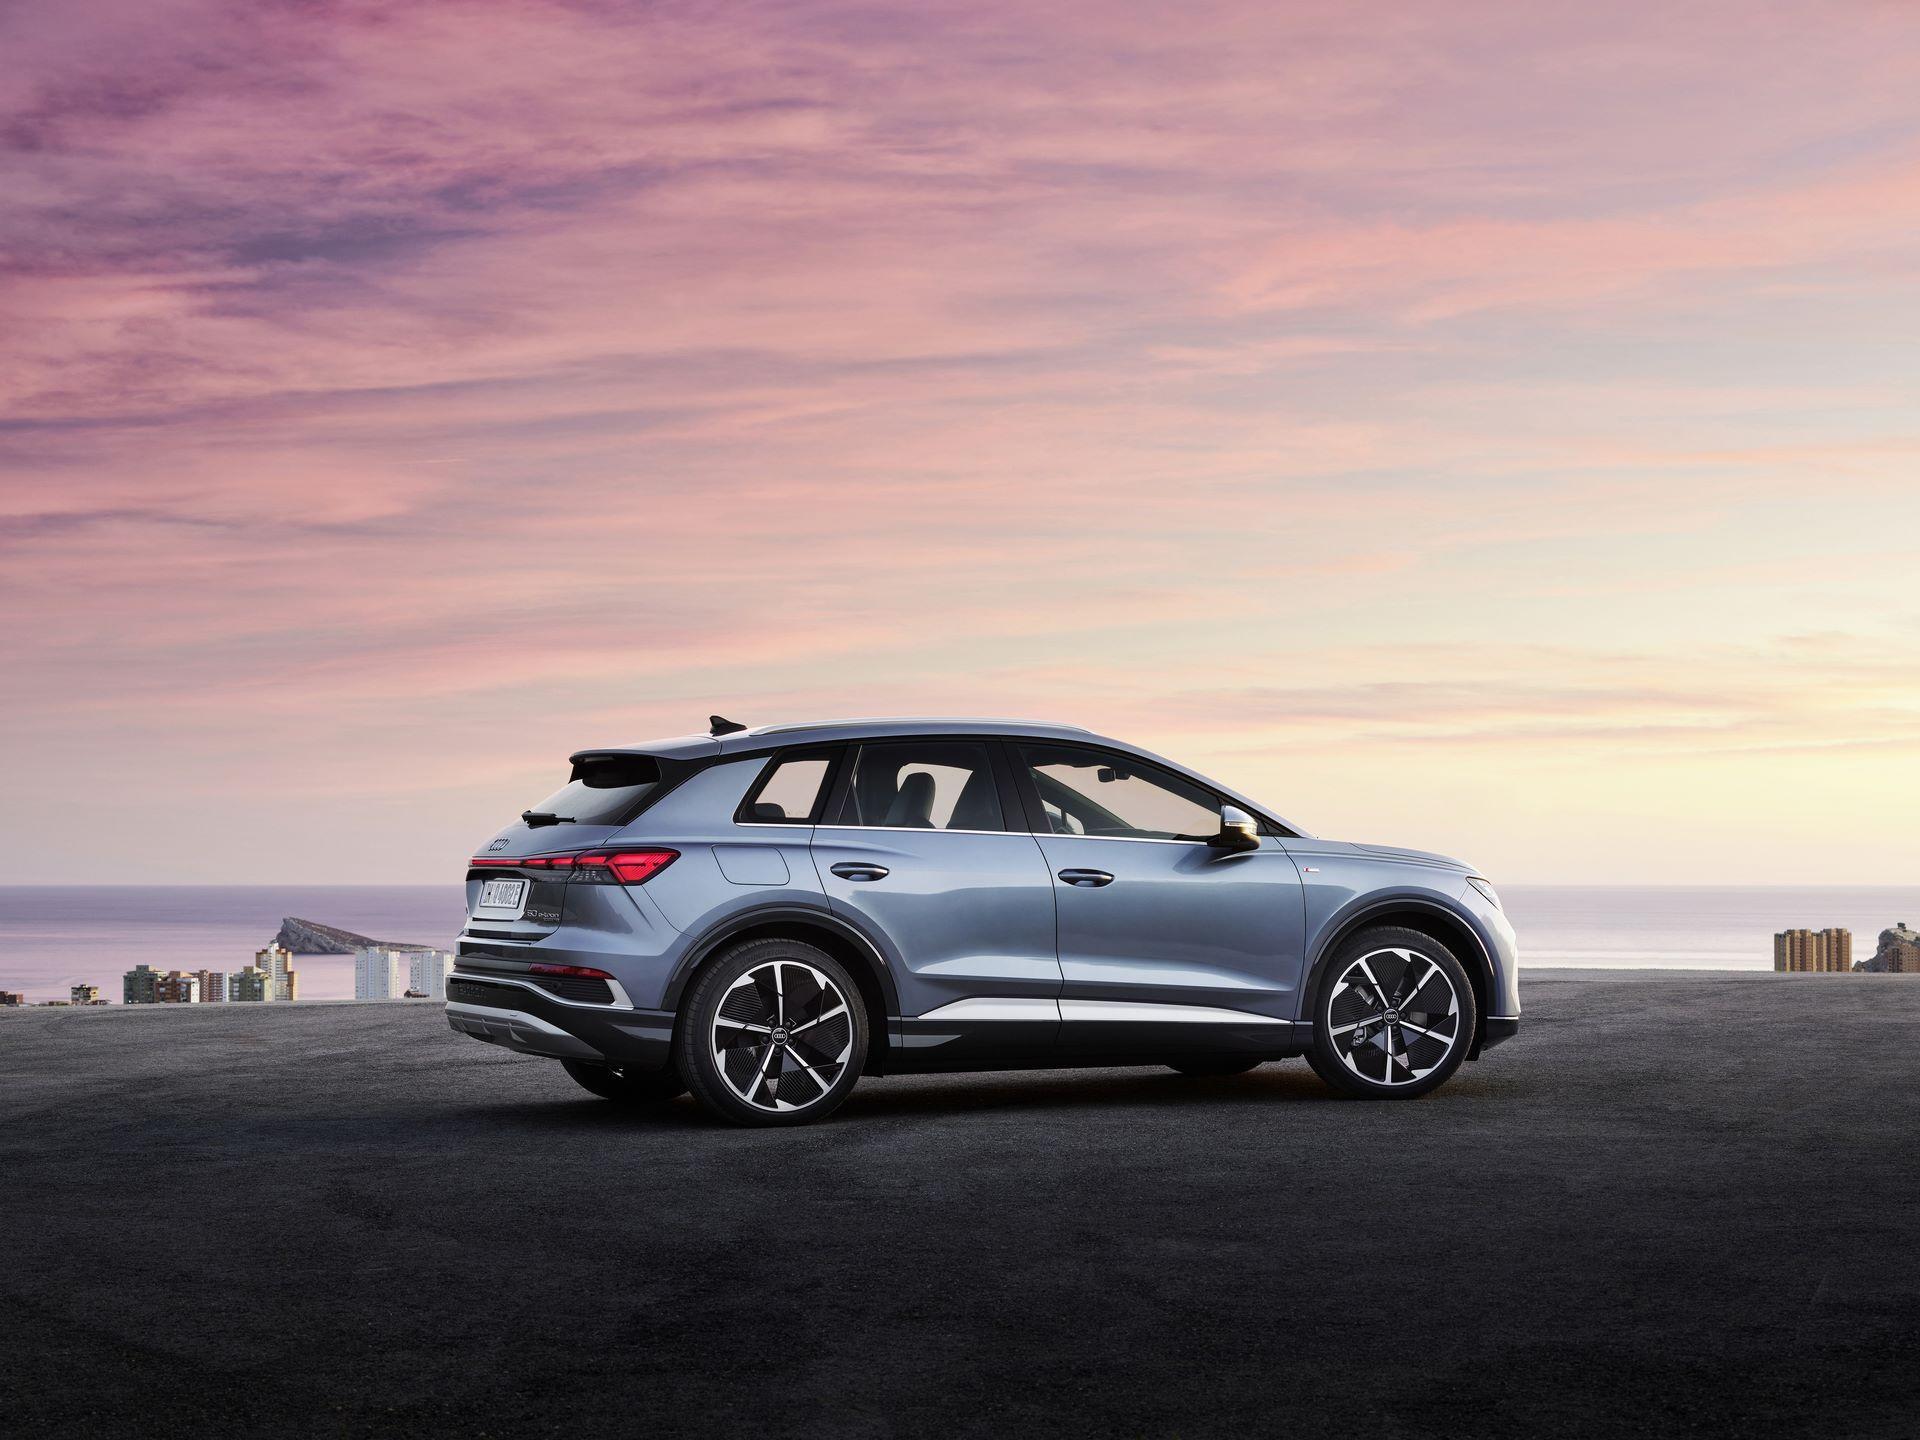 Audi-Q4-e-tron-and-Q4-e-tron-Sportback-51